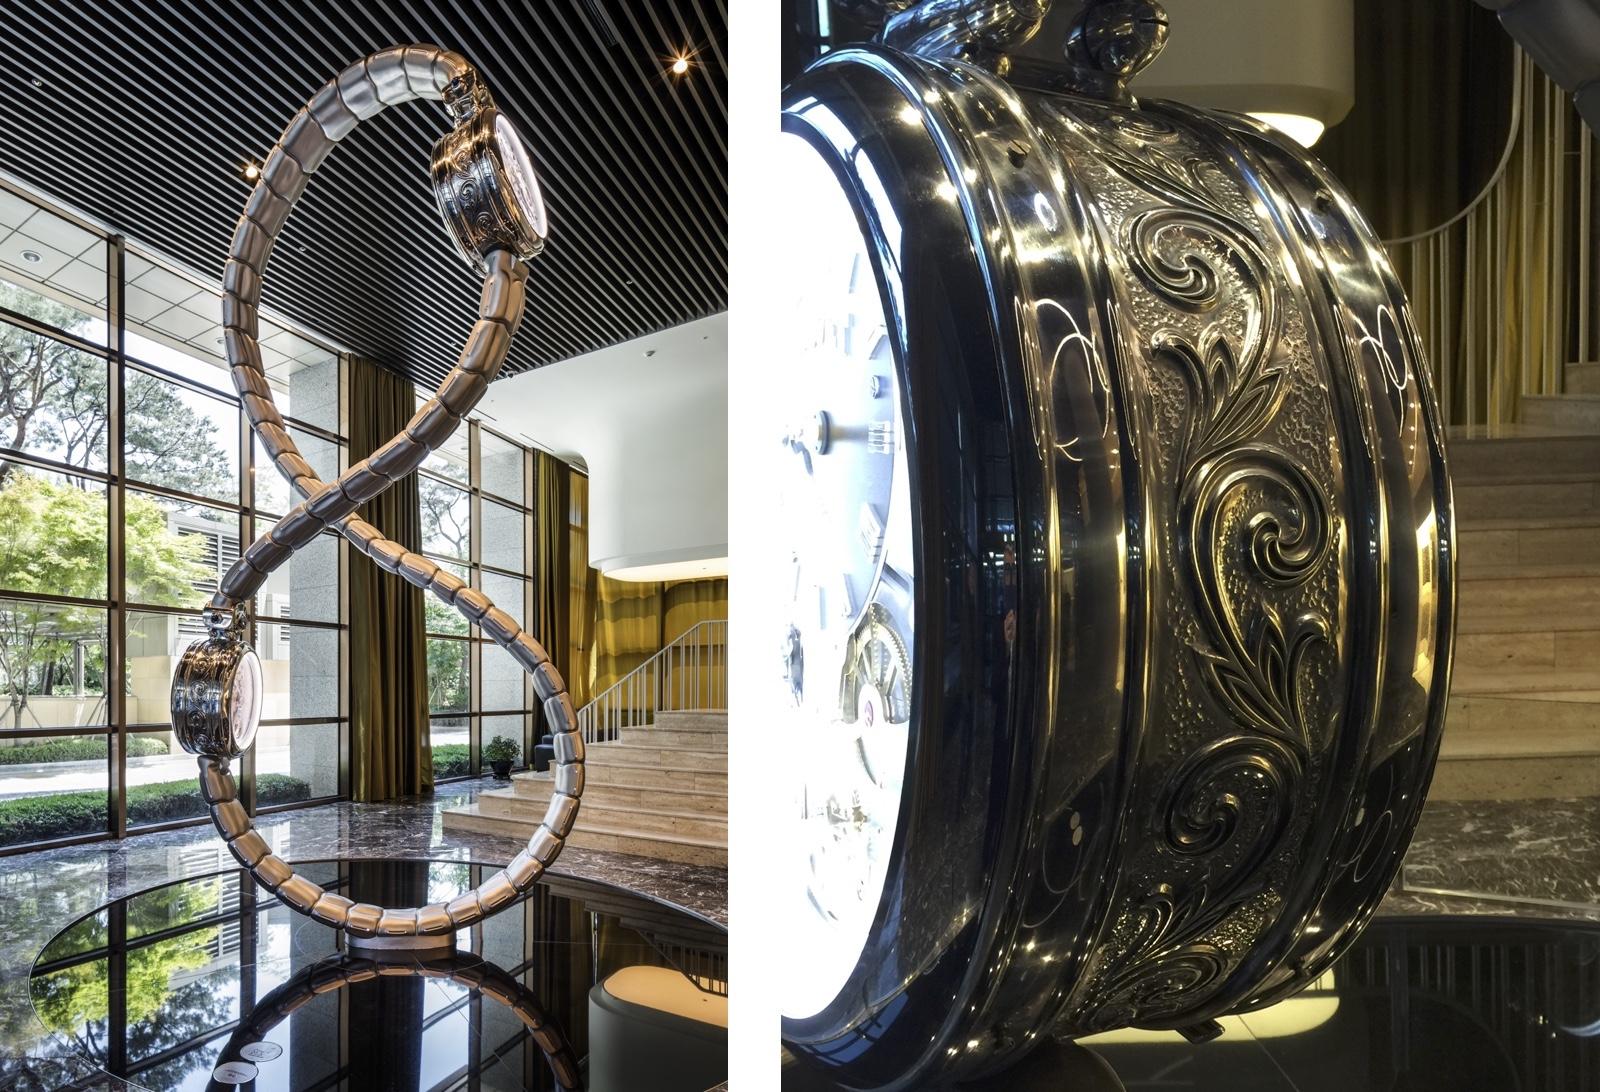 Bovet A Design Award Torre Asterium-Detalles